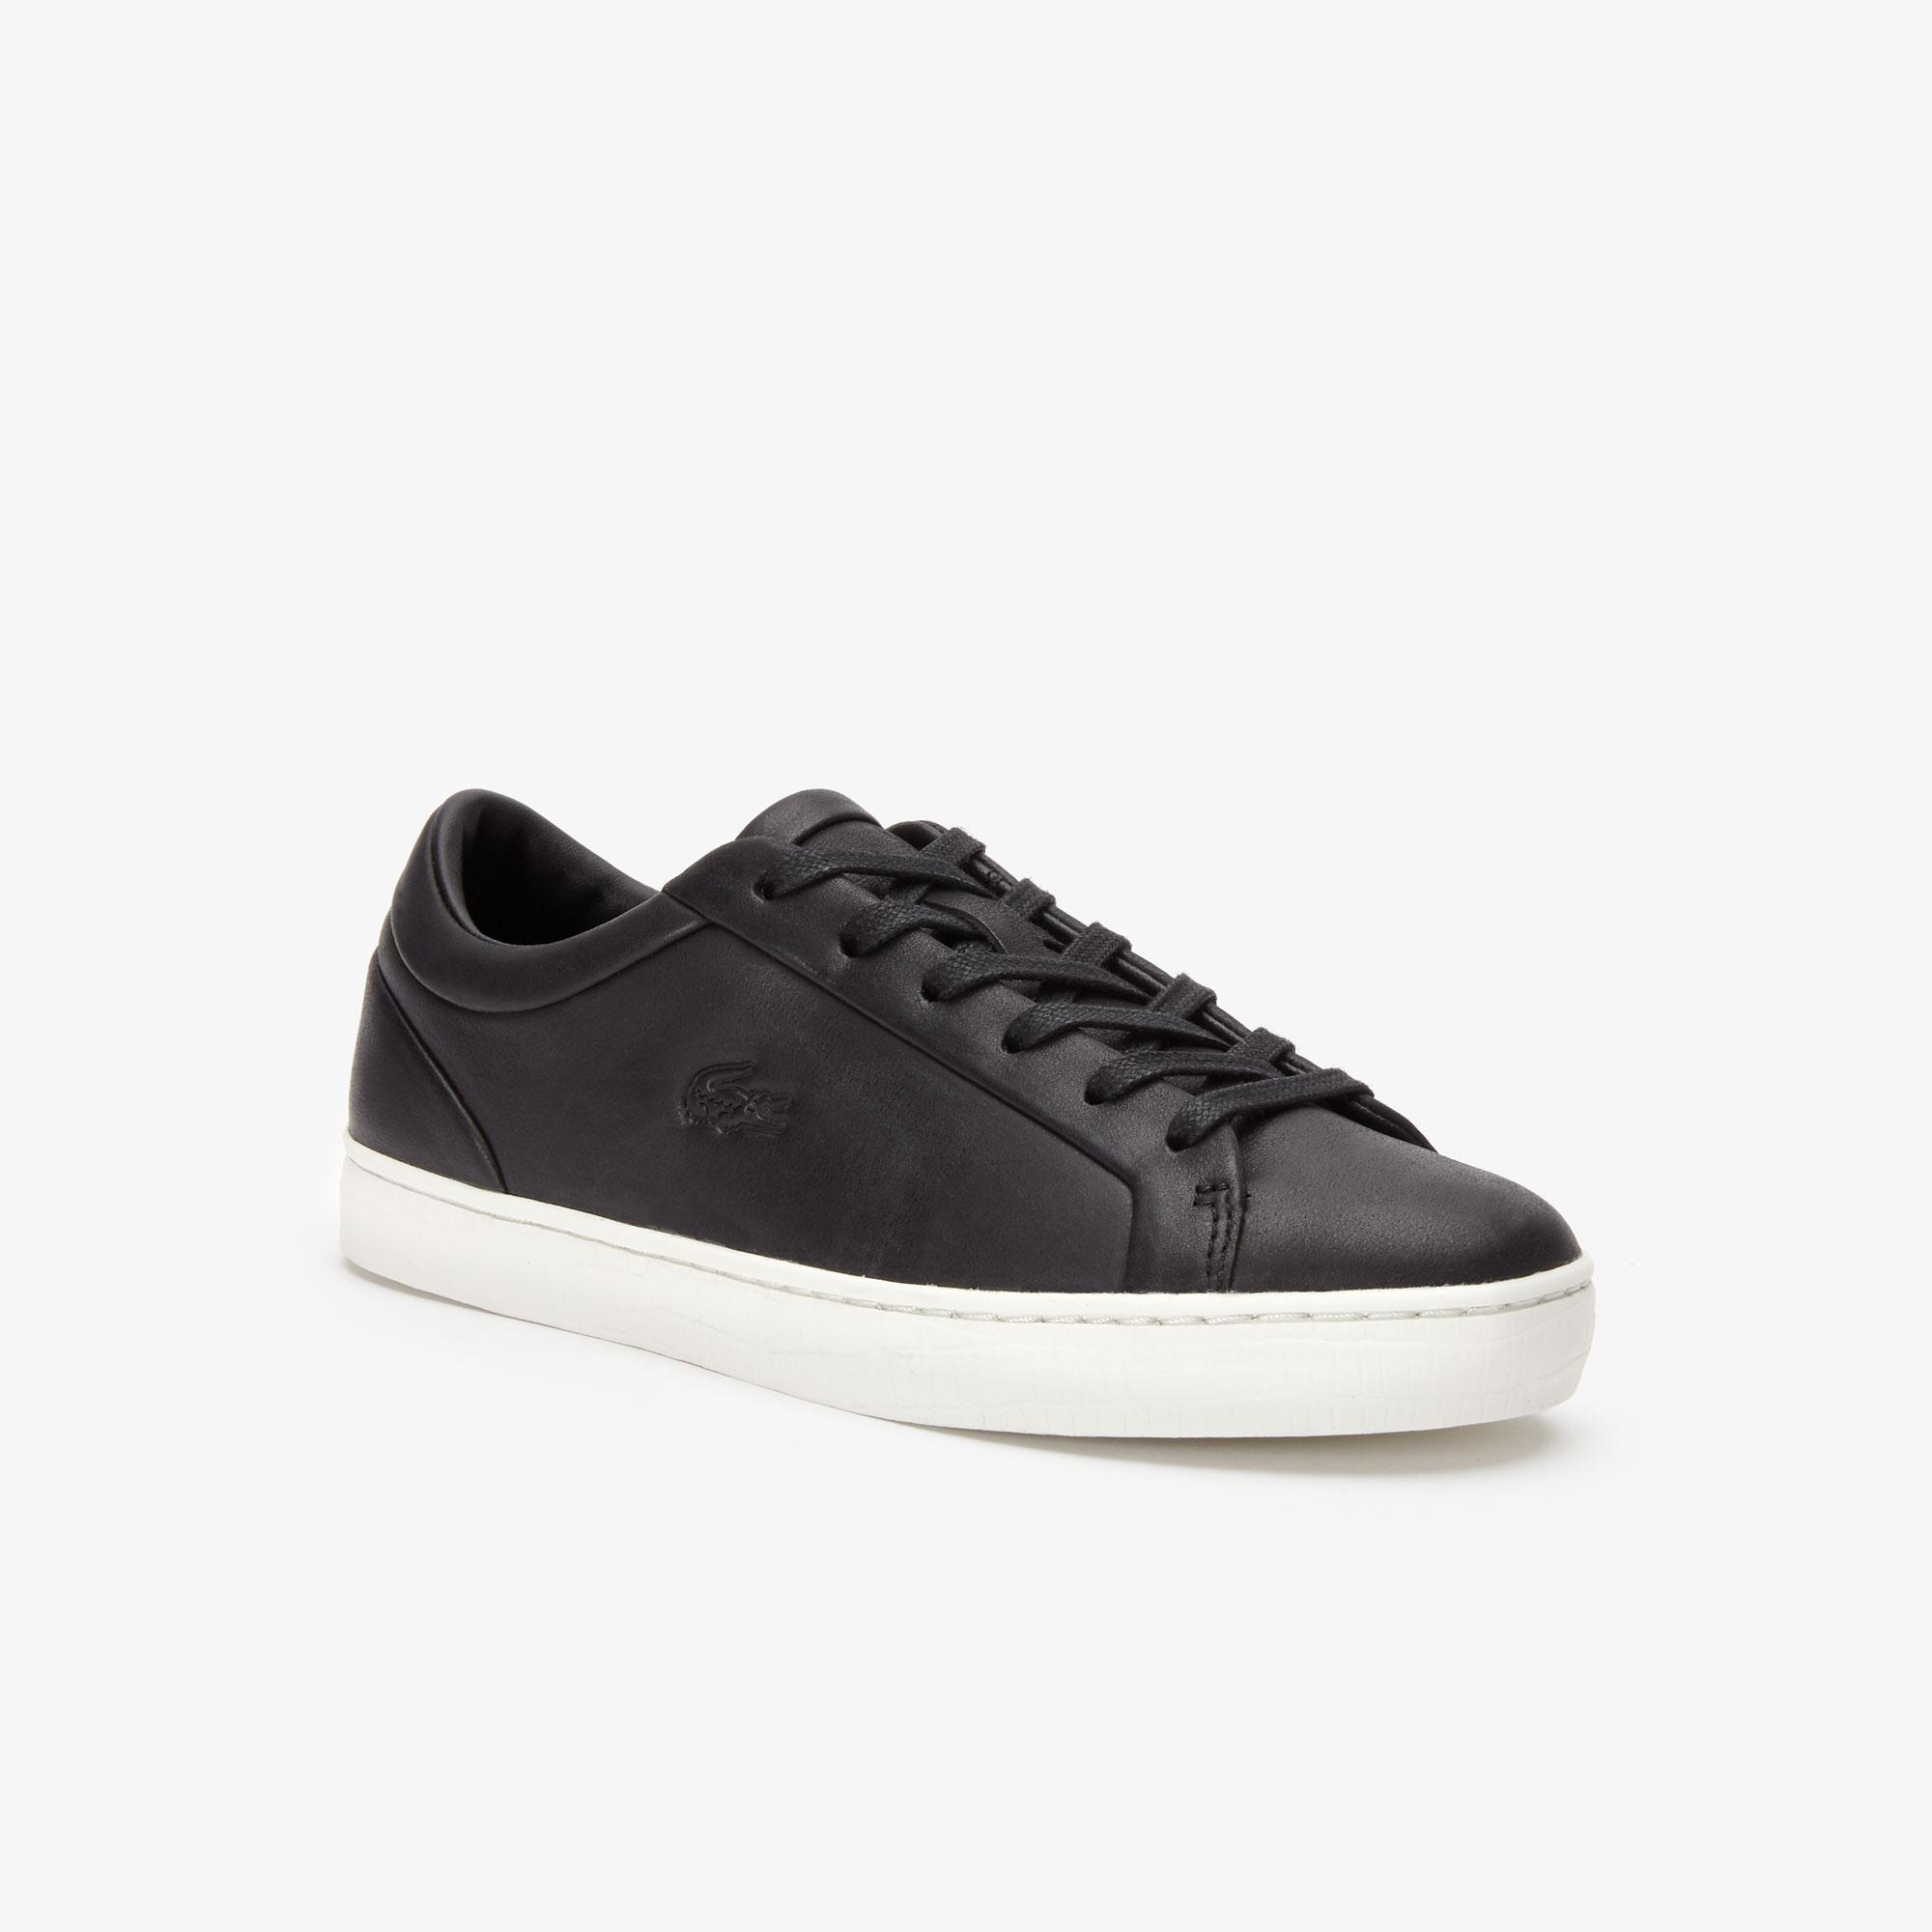 Lacoste Straightset 319 2 cfa Kadın Siyah Sneaker